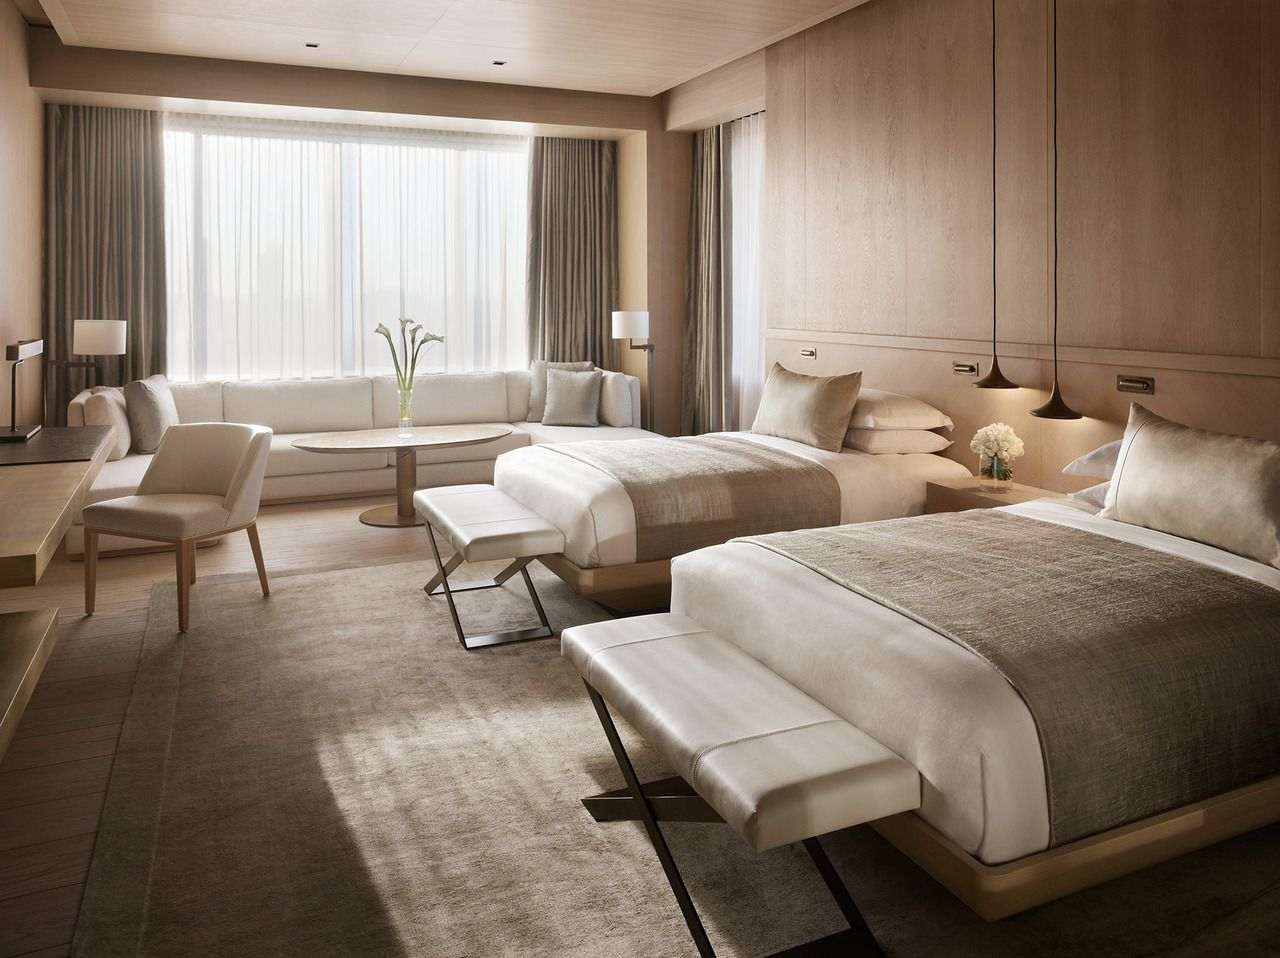 Found On Bing From Batteinteriordesigners Blogspot Com Hotel Bedroom Design Hotel Room Design Hotel Interiors